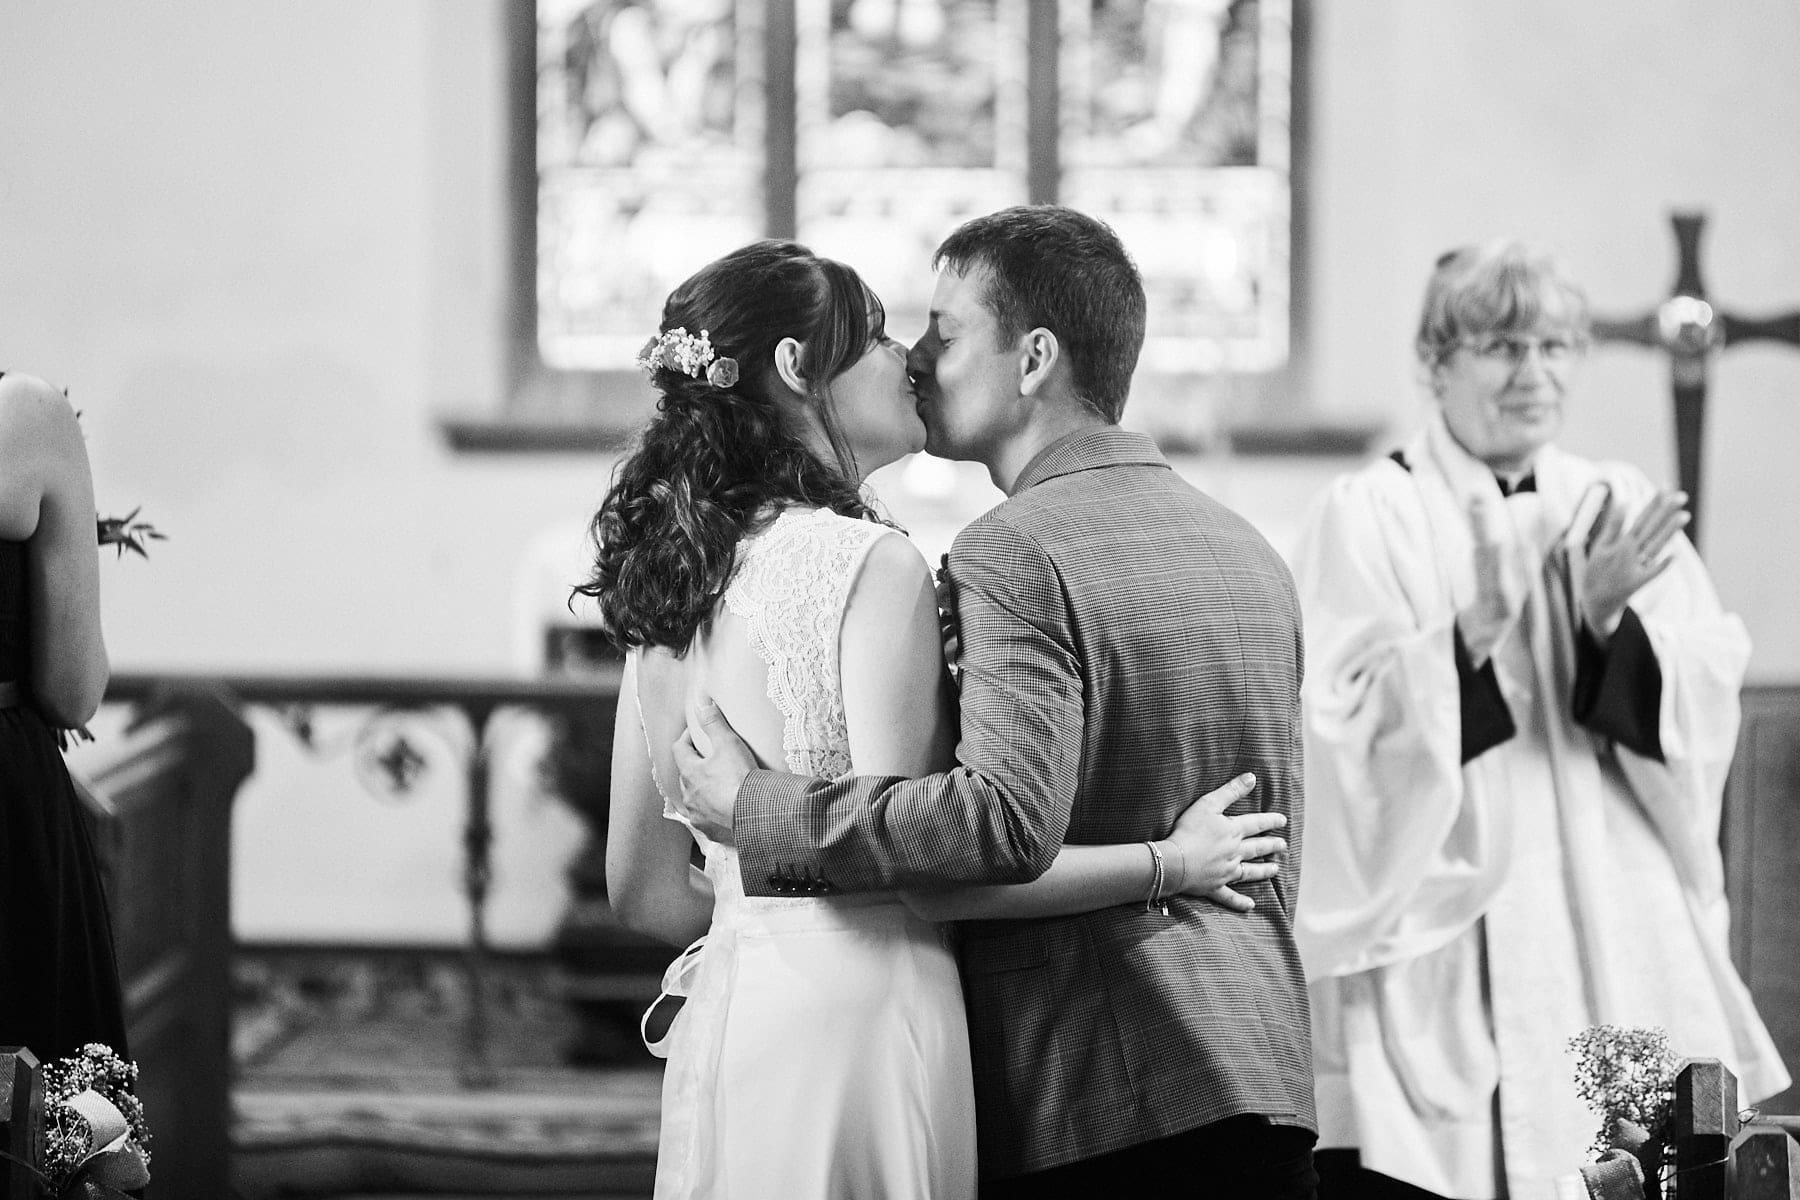 A couple seal their marriage with a kiss at Kirkby on Bain Church near Woodhall Spa